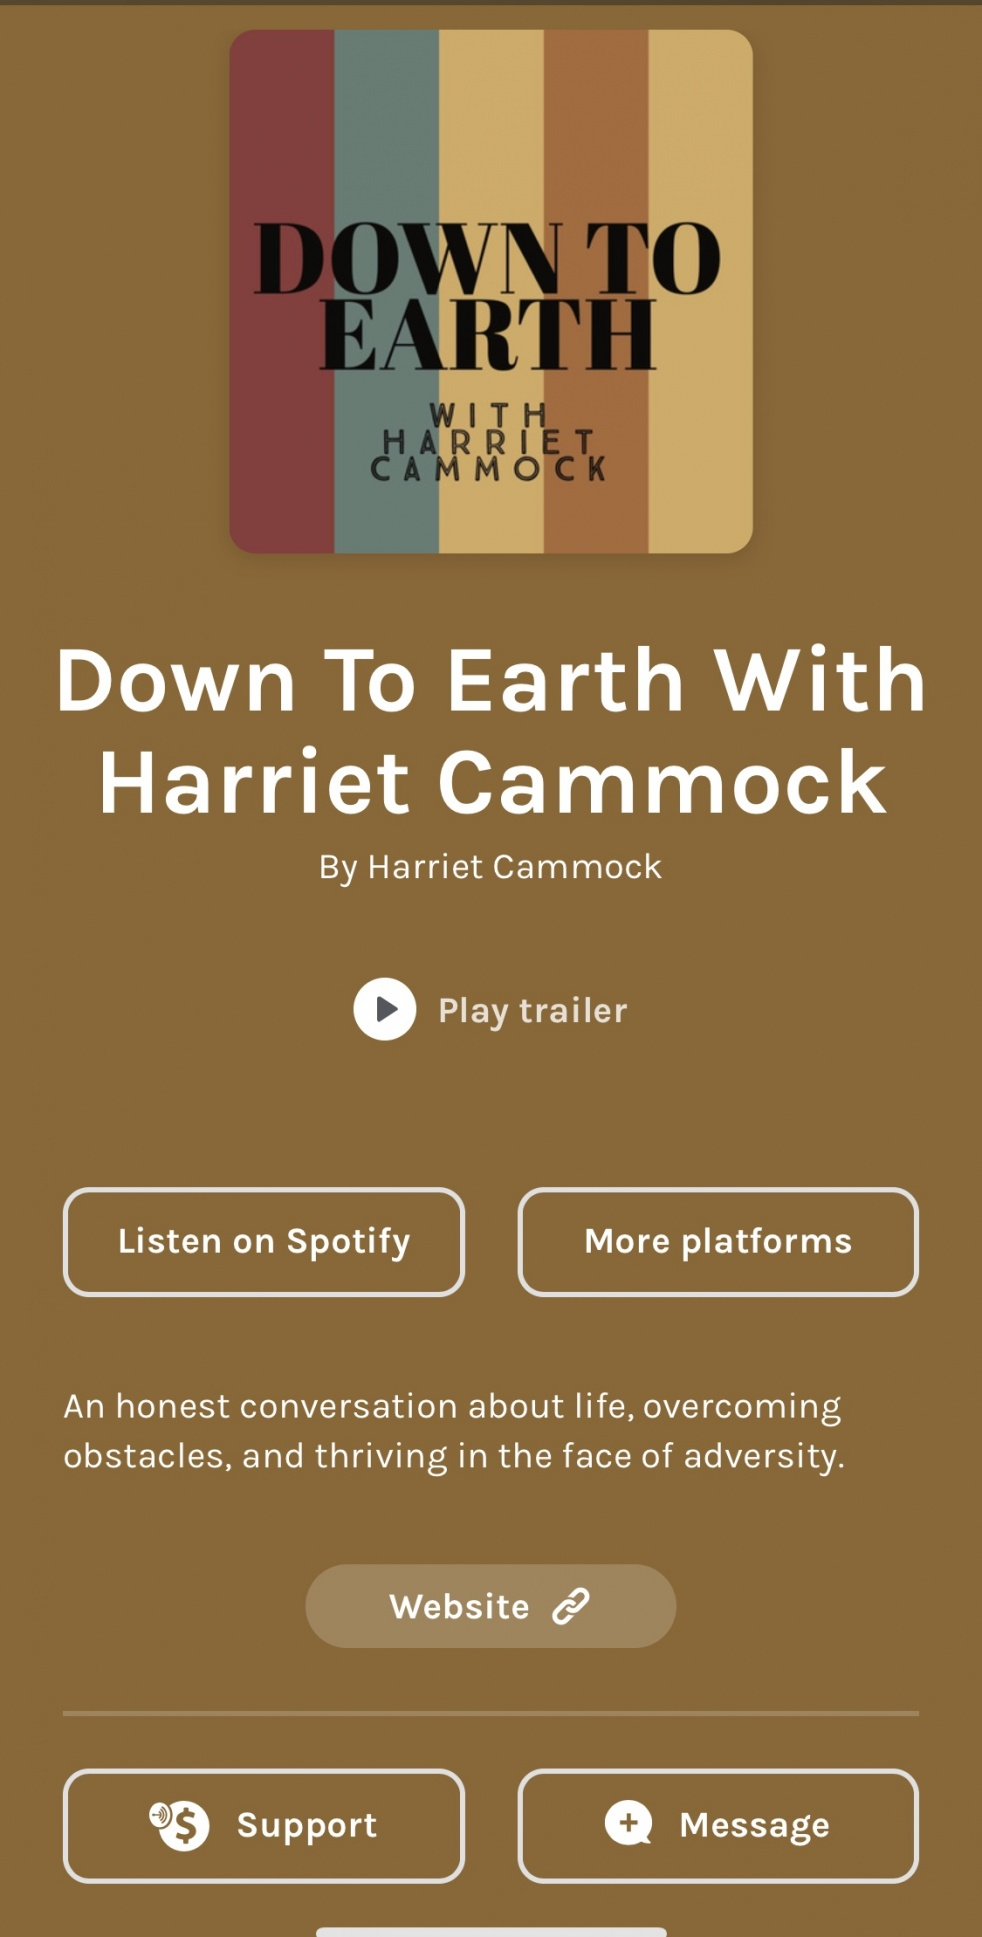 Down To Earth With Harriet Cammock - immagine di copertina